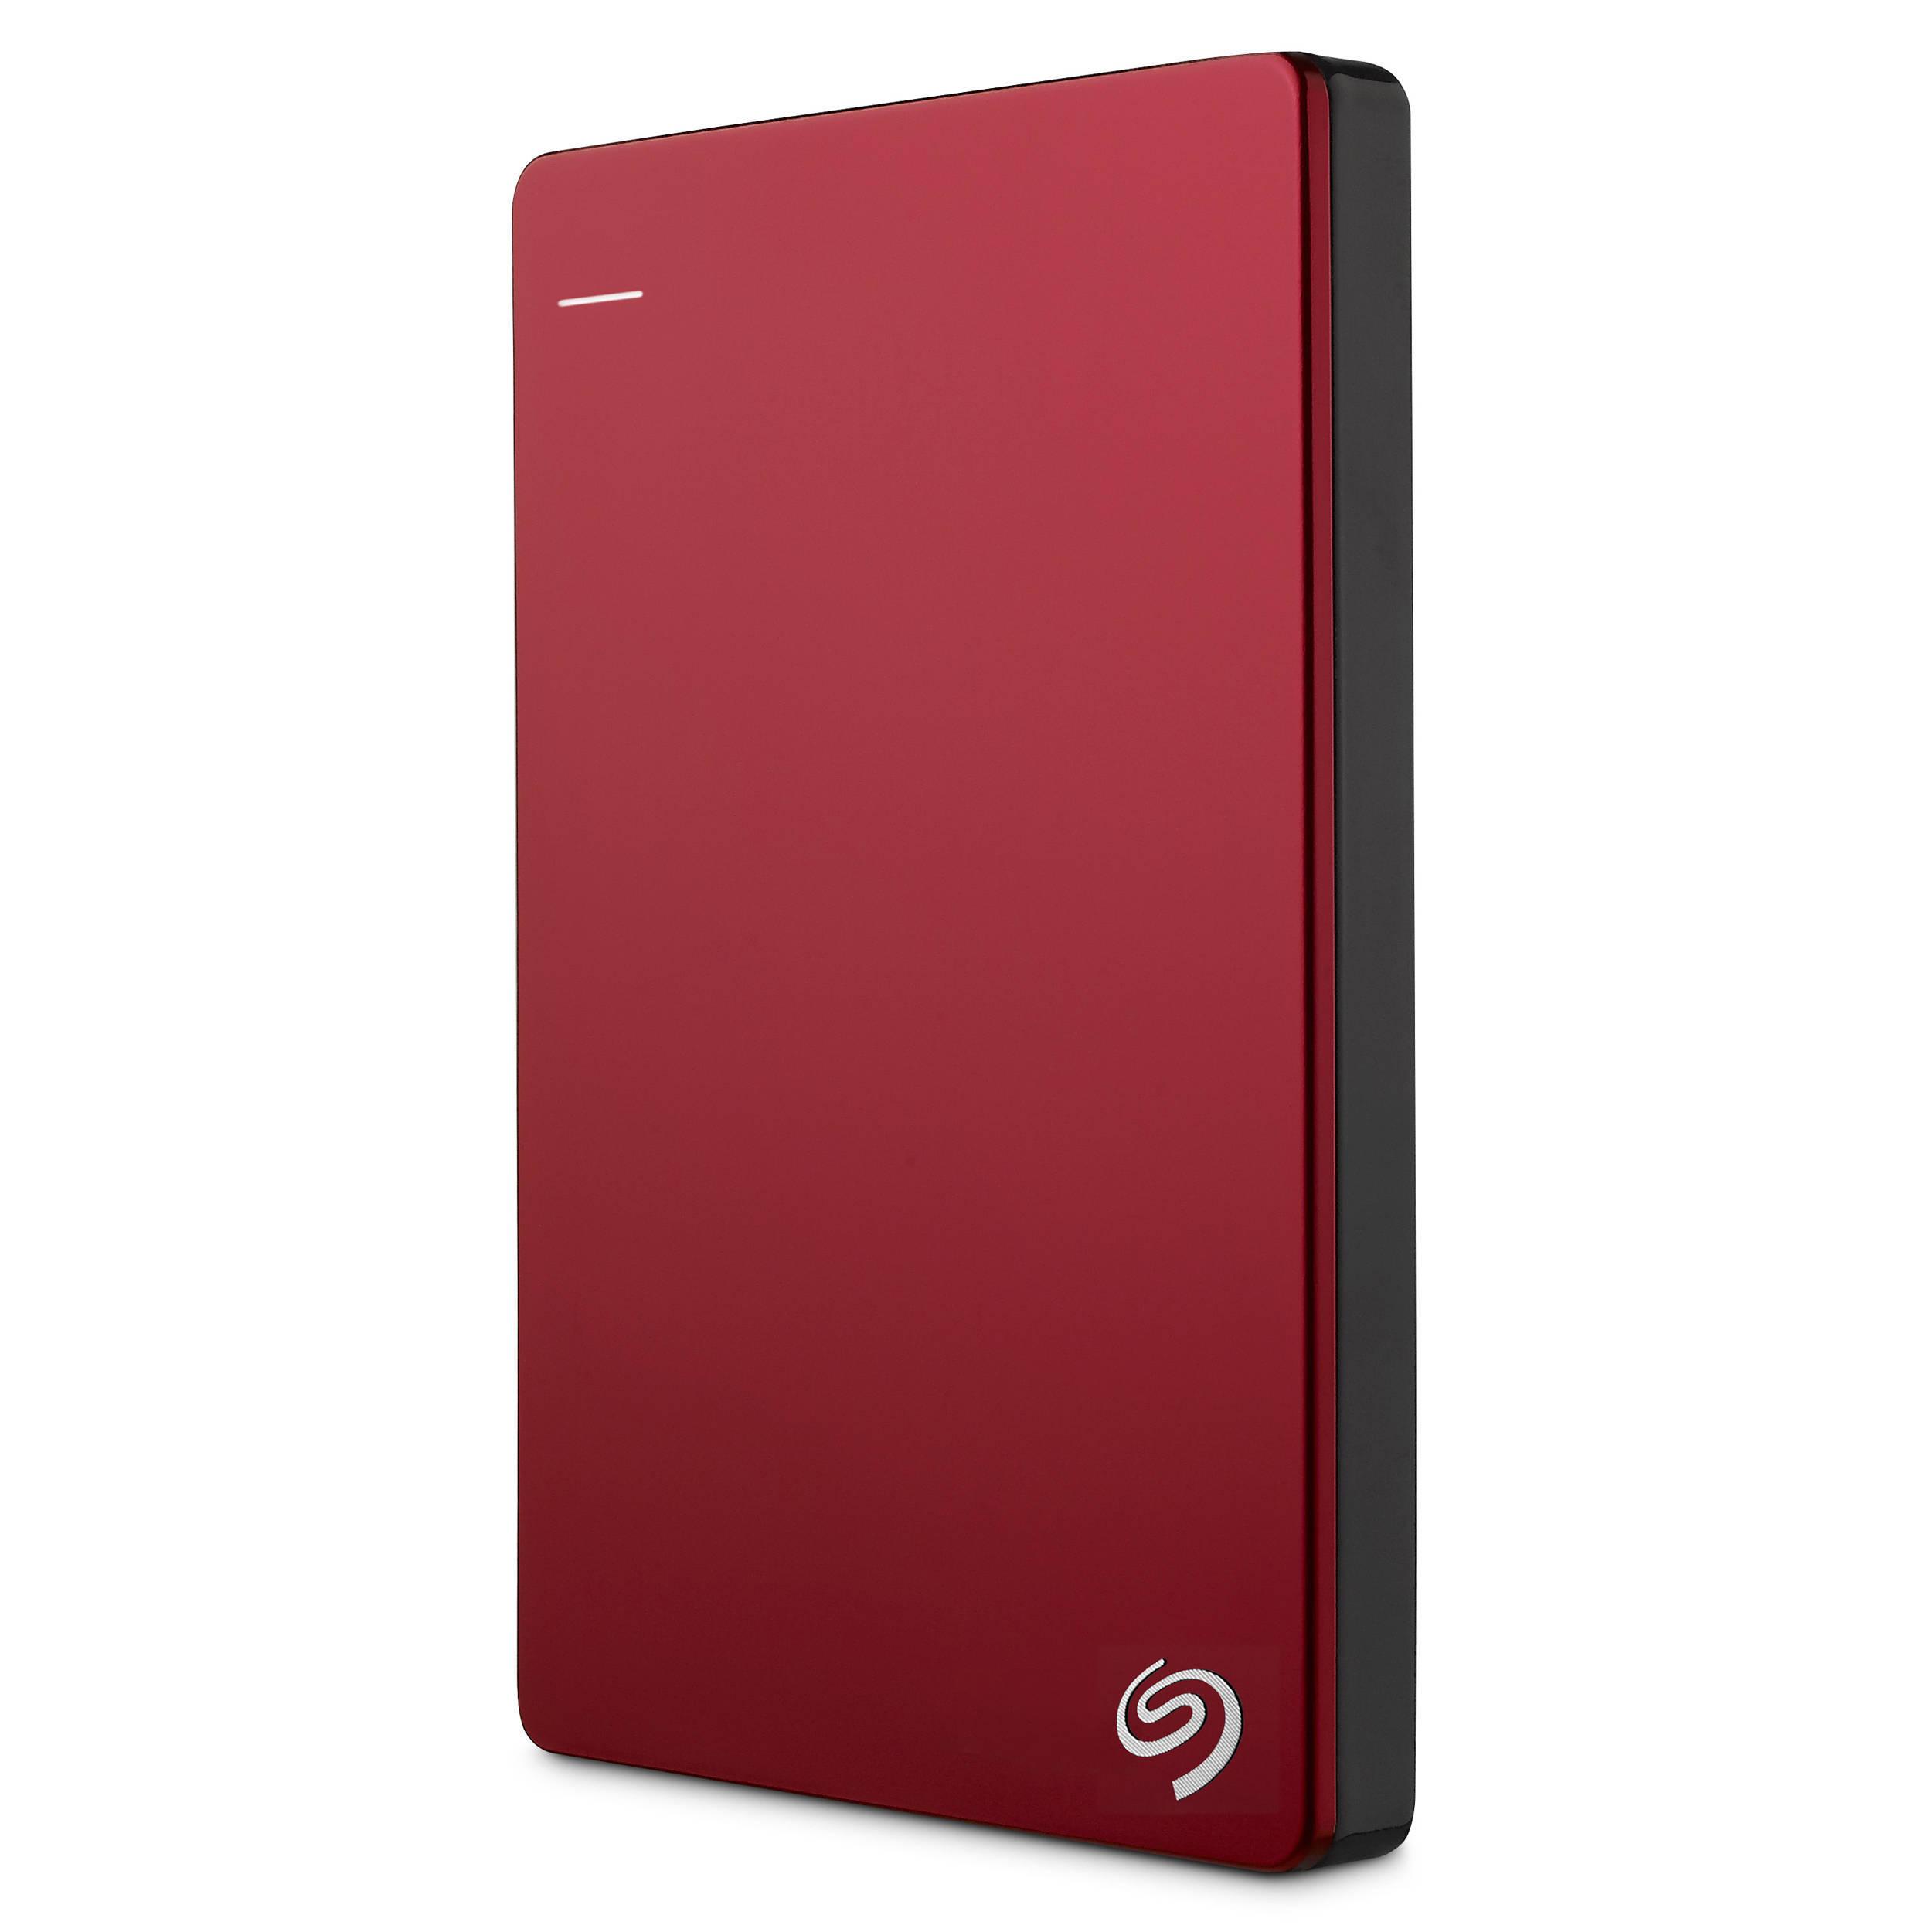 Seagate STDR1000303 1TB Slim Backup Plus Portable Drive (Red)